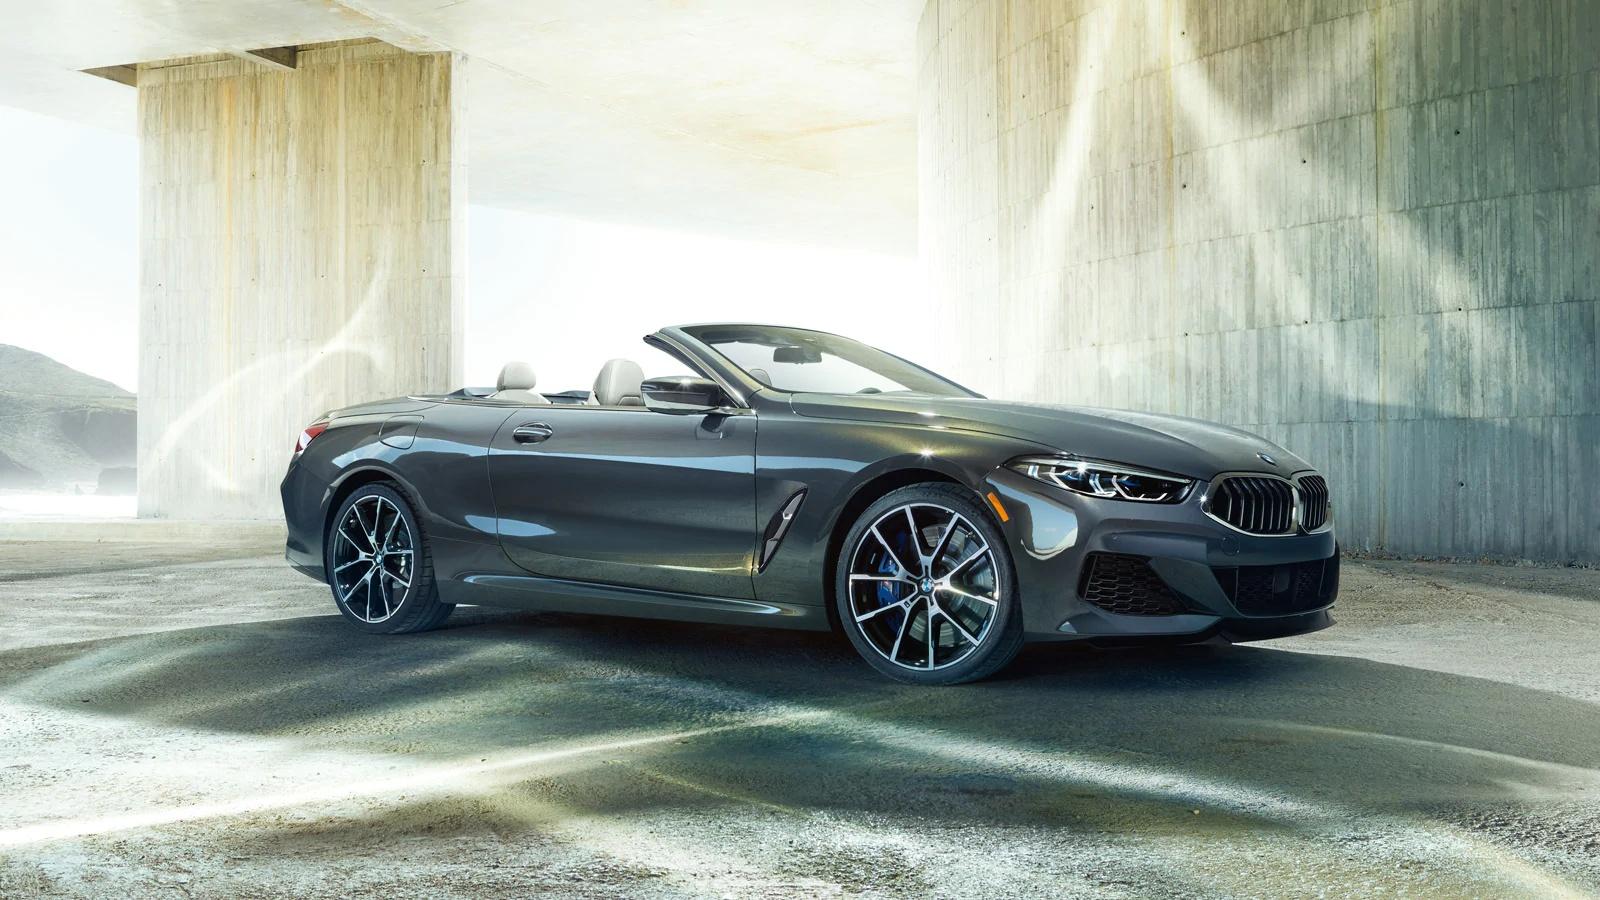 2019 BMW M850i xDrive Convertible